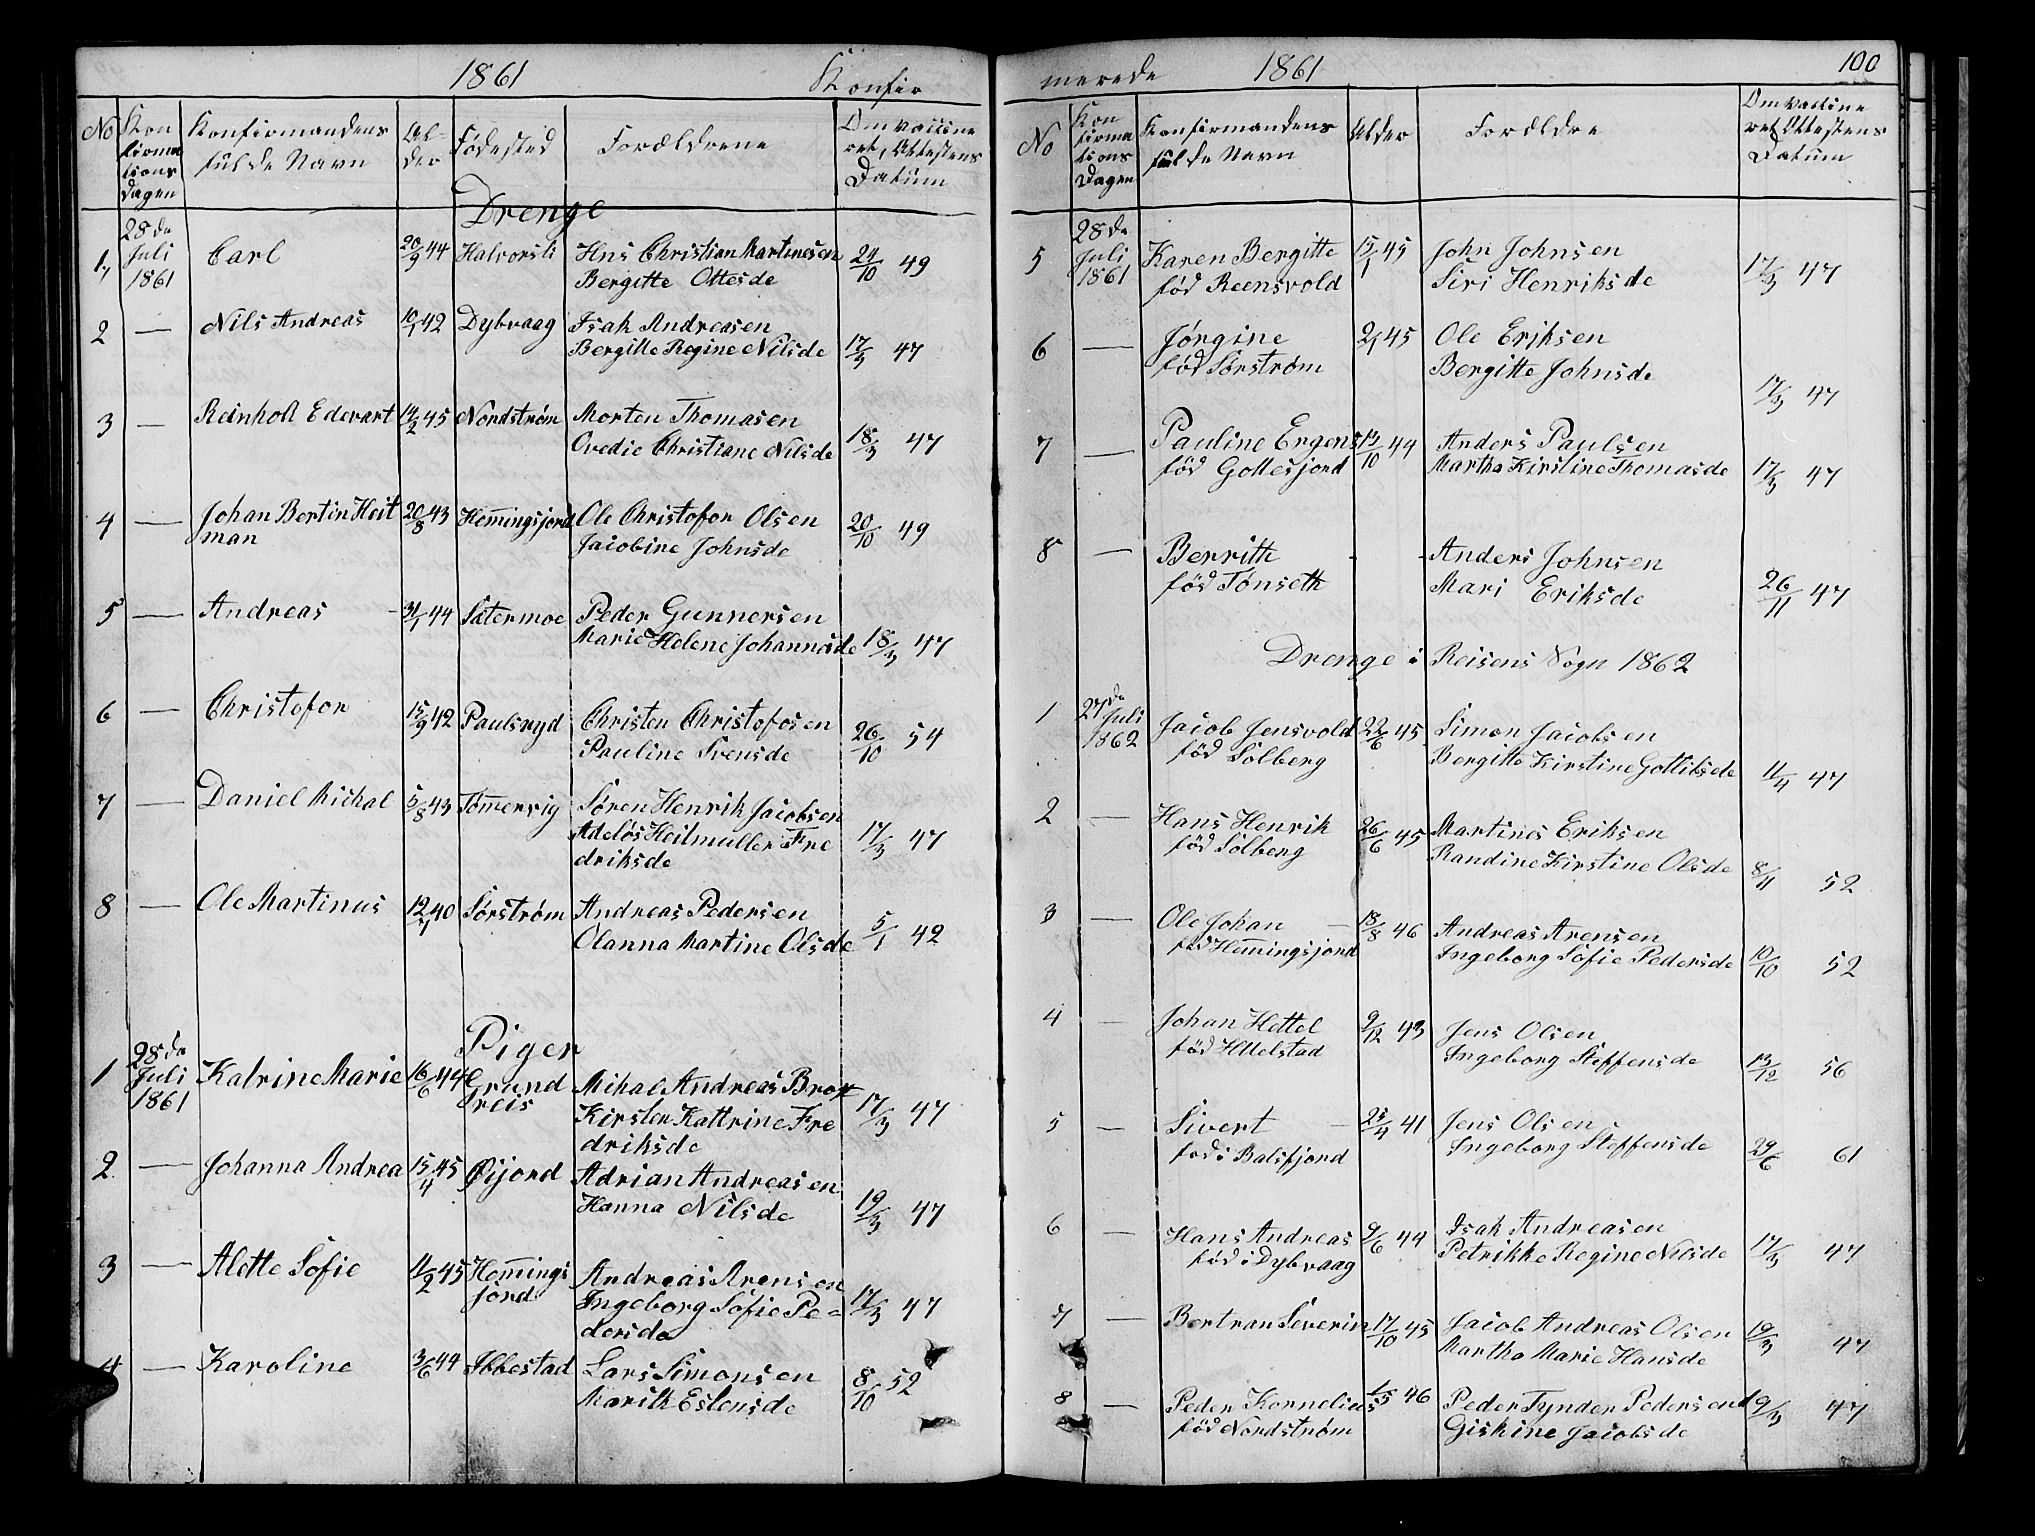 SATØ, Tranøy sokneprestkontor, I/Ia/Iab/L0021klokker: Klokkerbok nr. 21, 1861-1886, s. 100